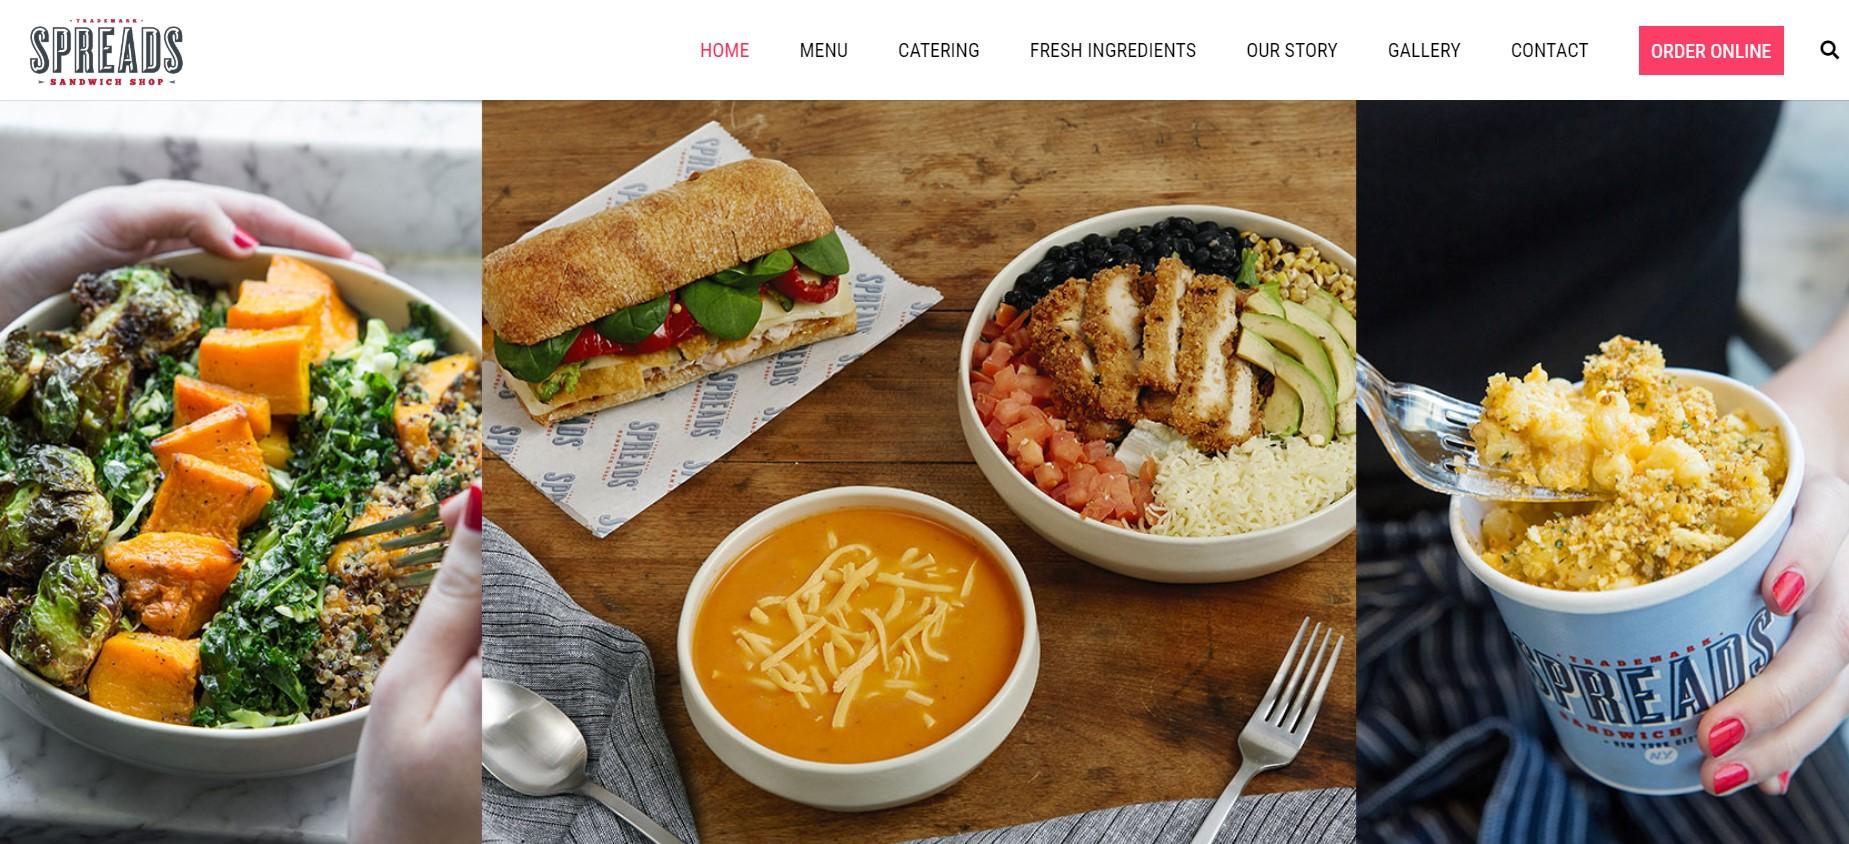 spreads sandwich shop in new york